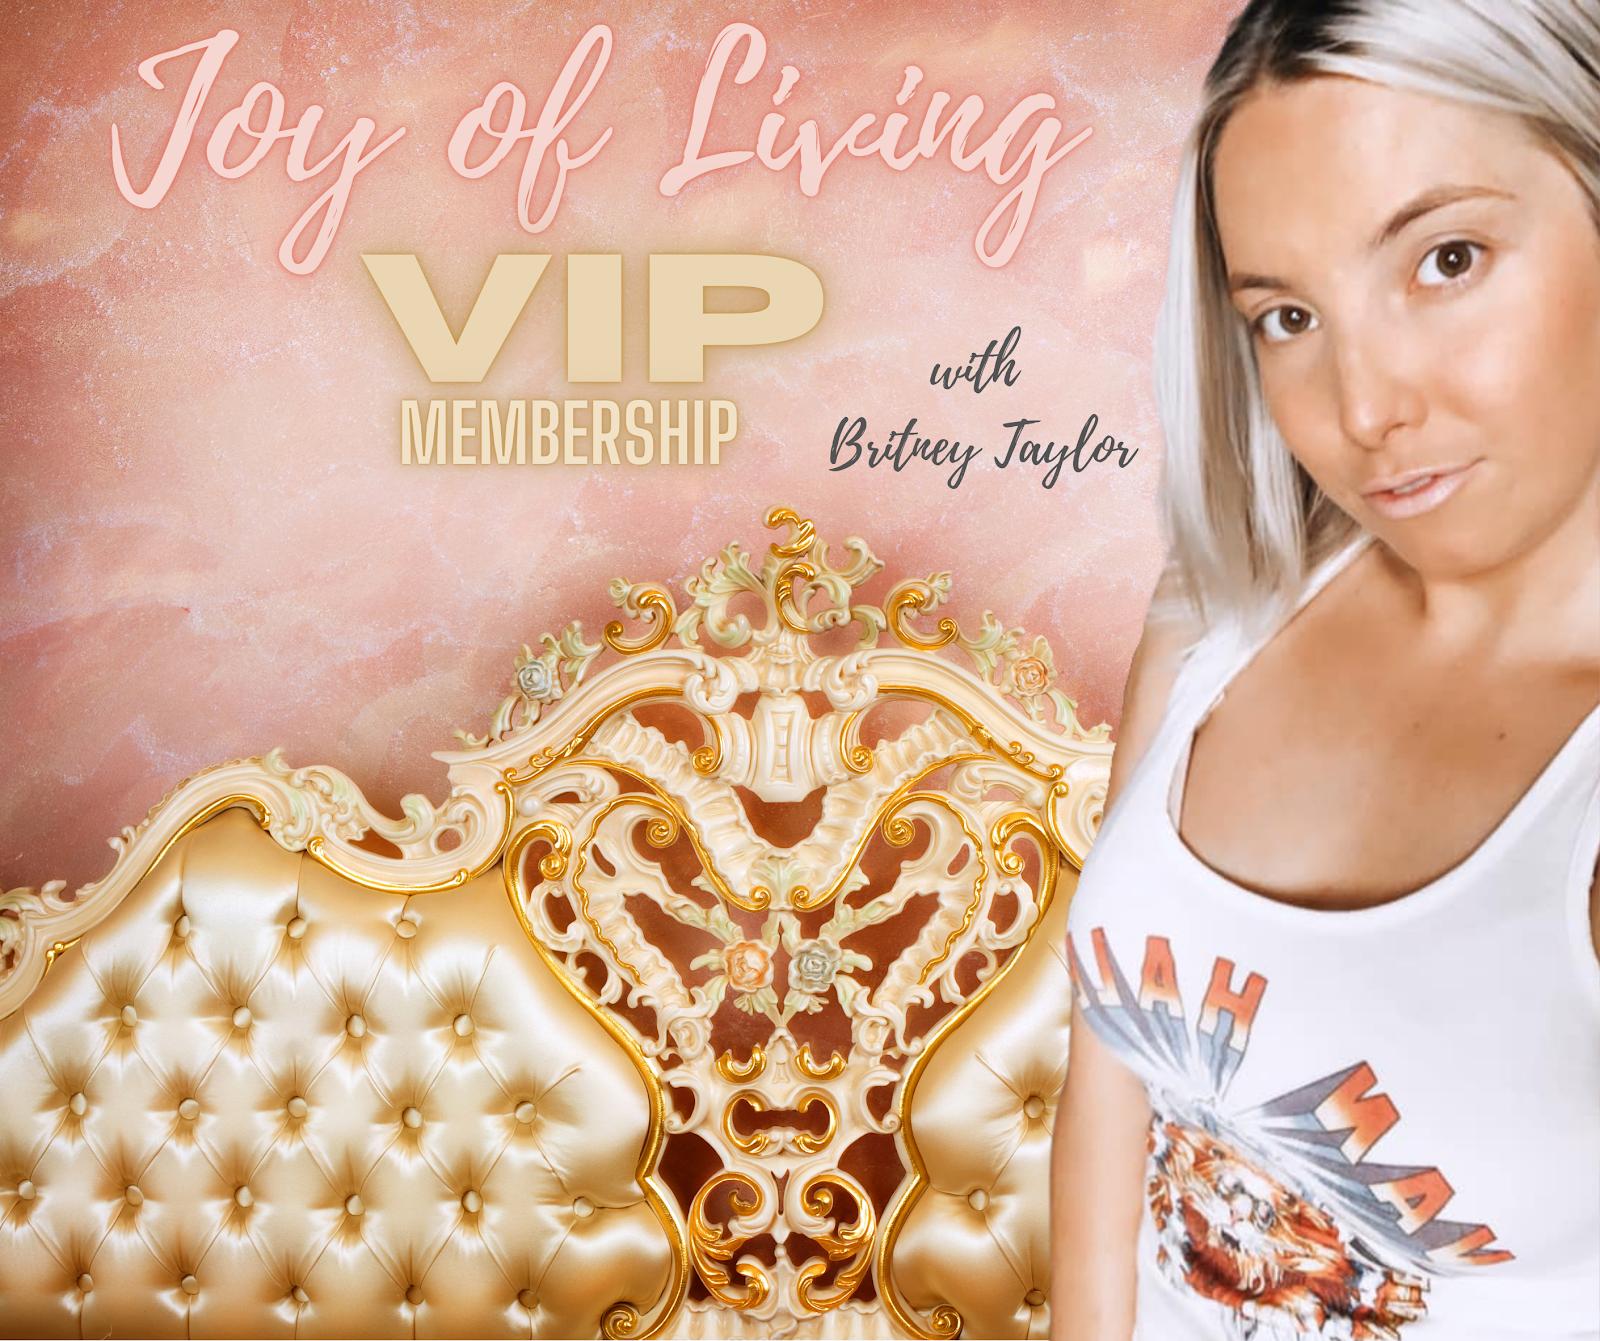 Joy of Living VIP membership with Britney Taylor